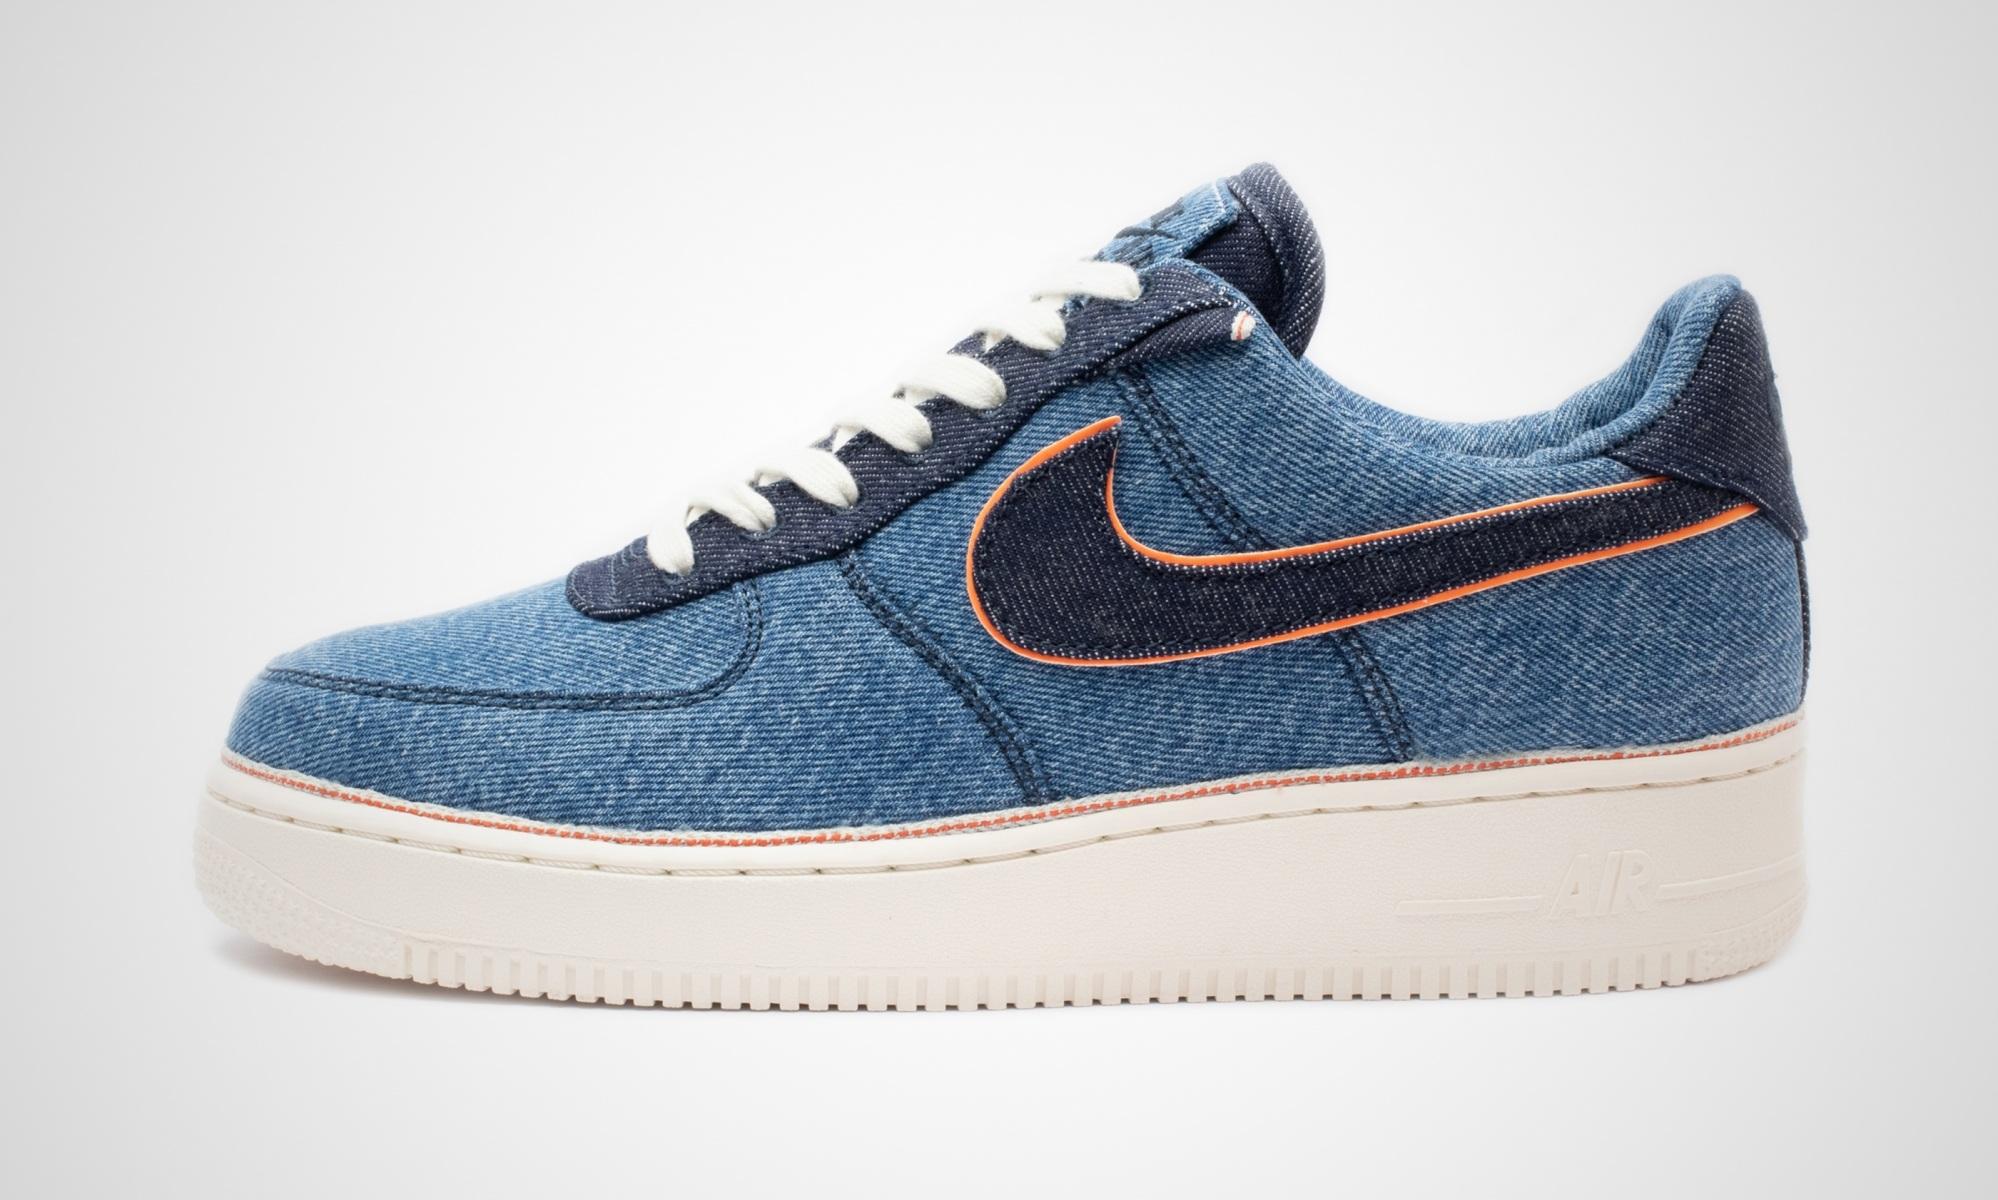 Nike x 3x1 Air Force 1 Stonewash Blue | Dead Stock Sneakerblog